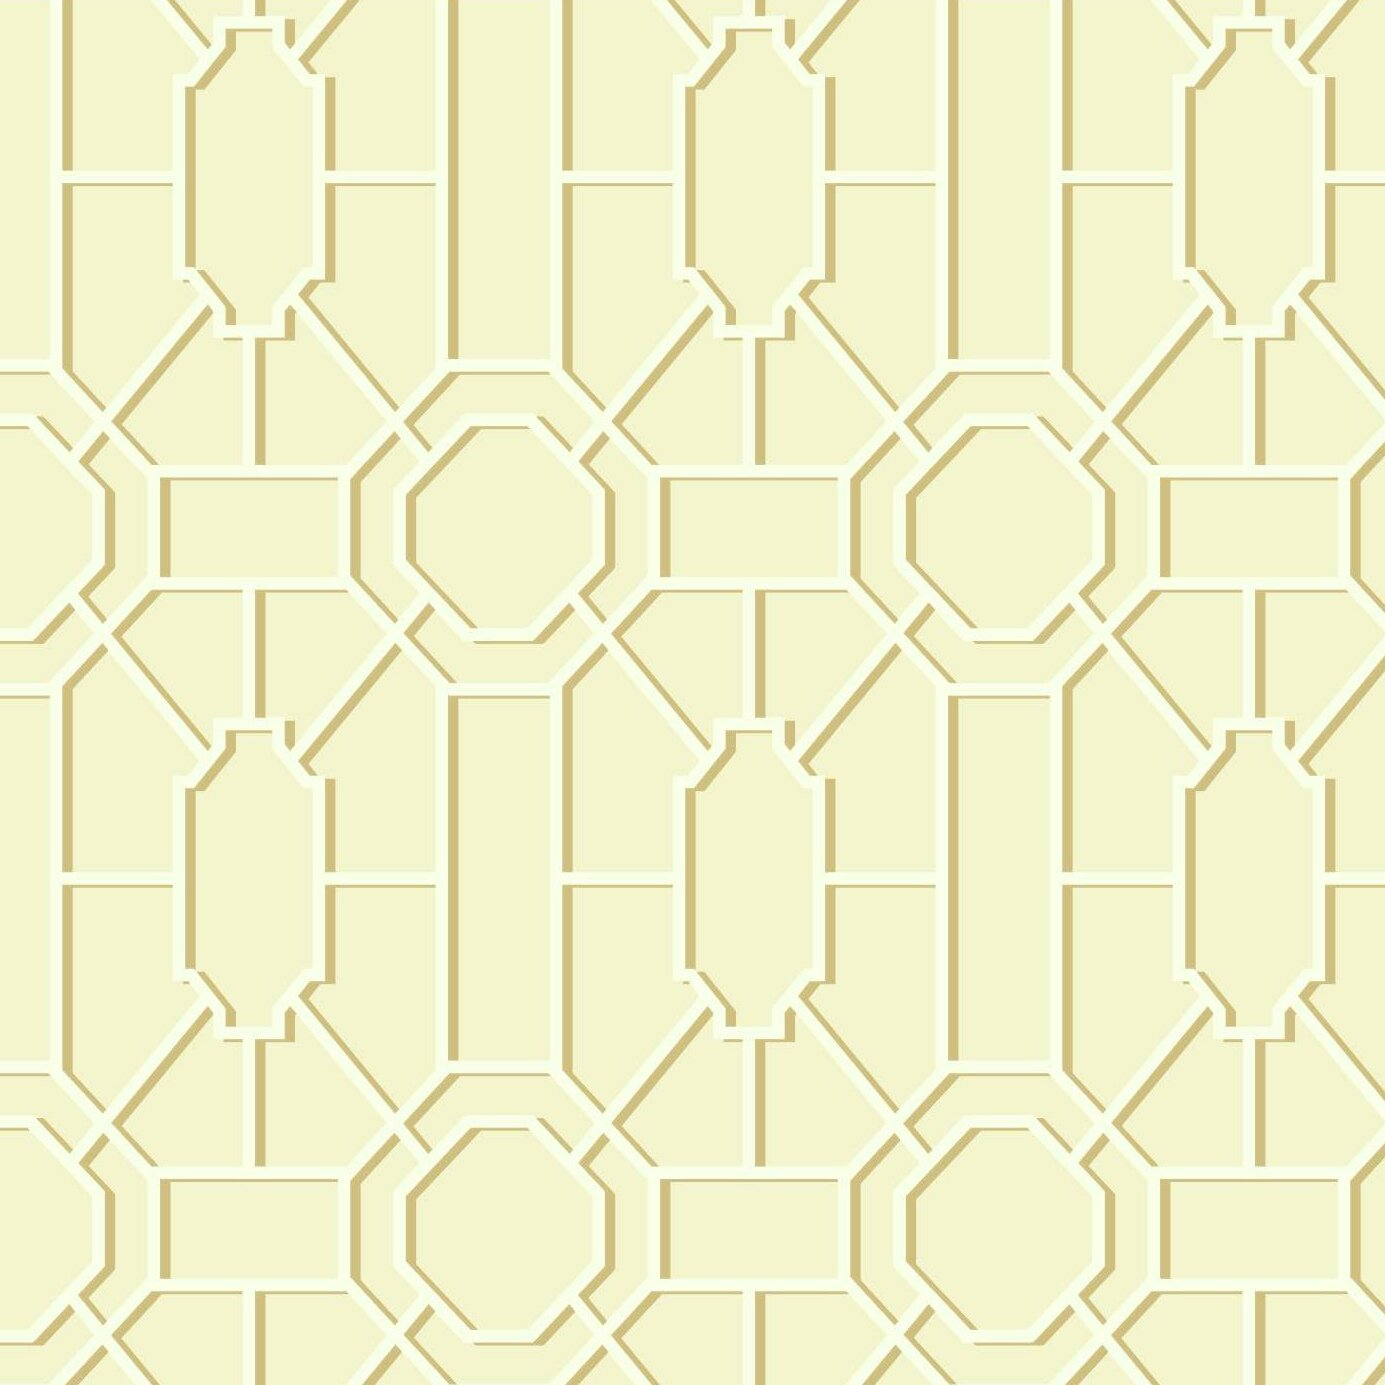 Modern Trellis Wallpaper Black White Lattice On Sure Strip Geometric Home Decor